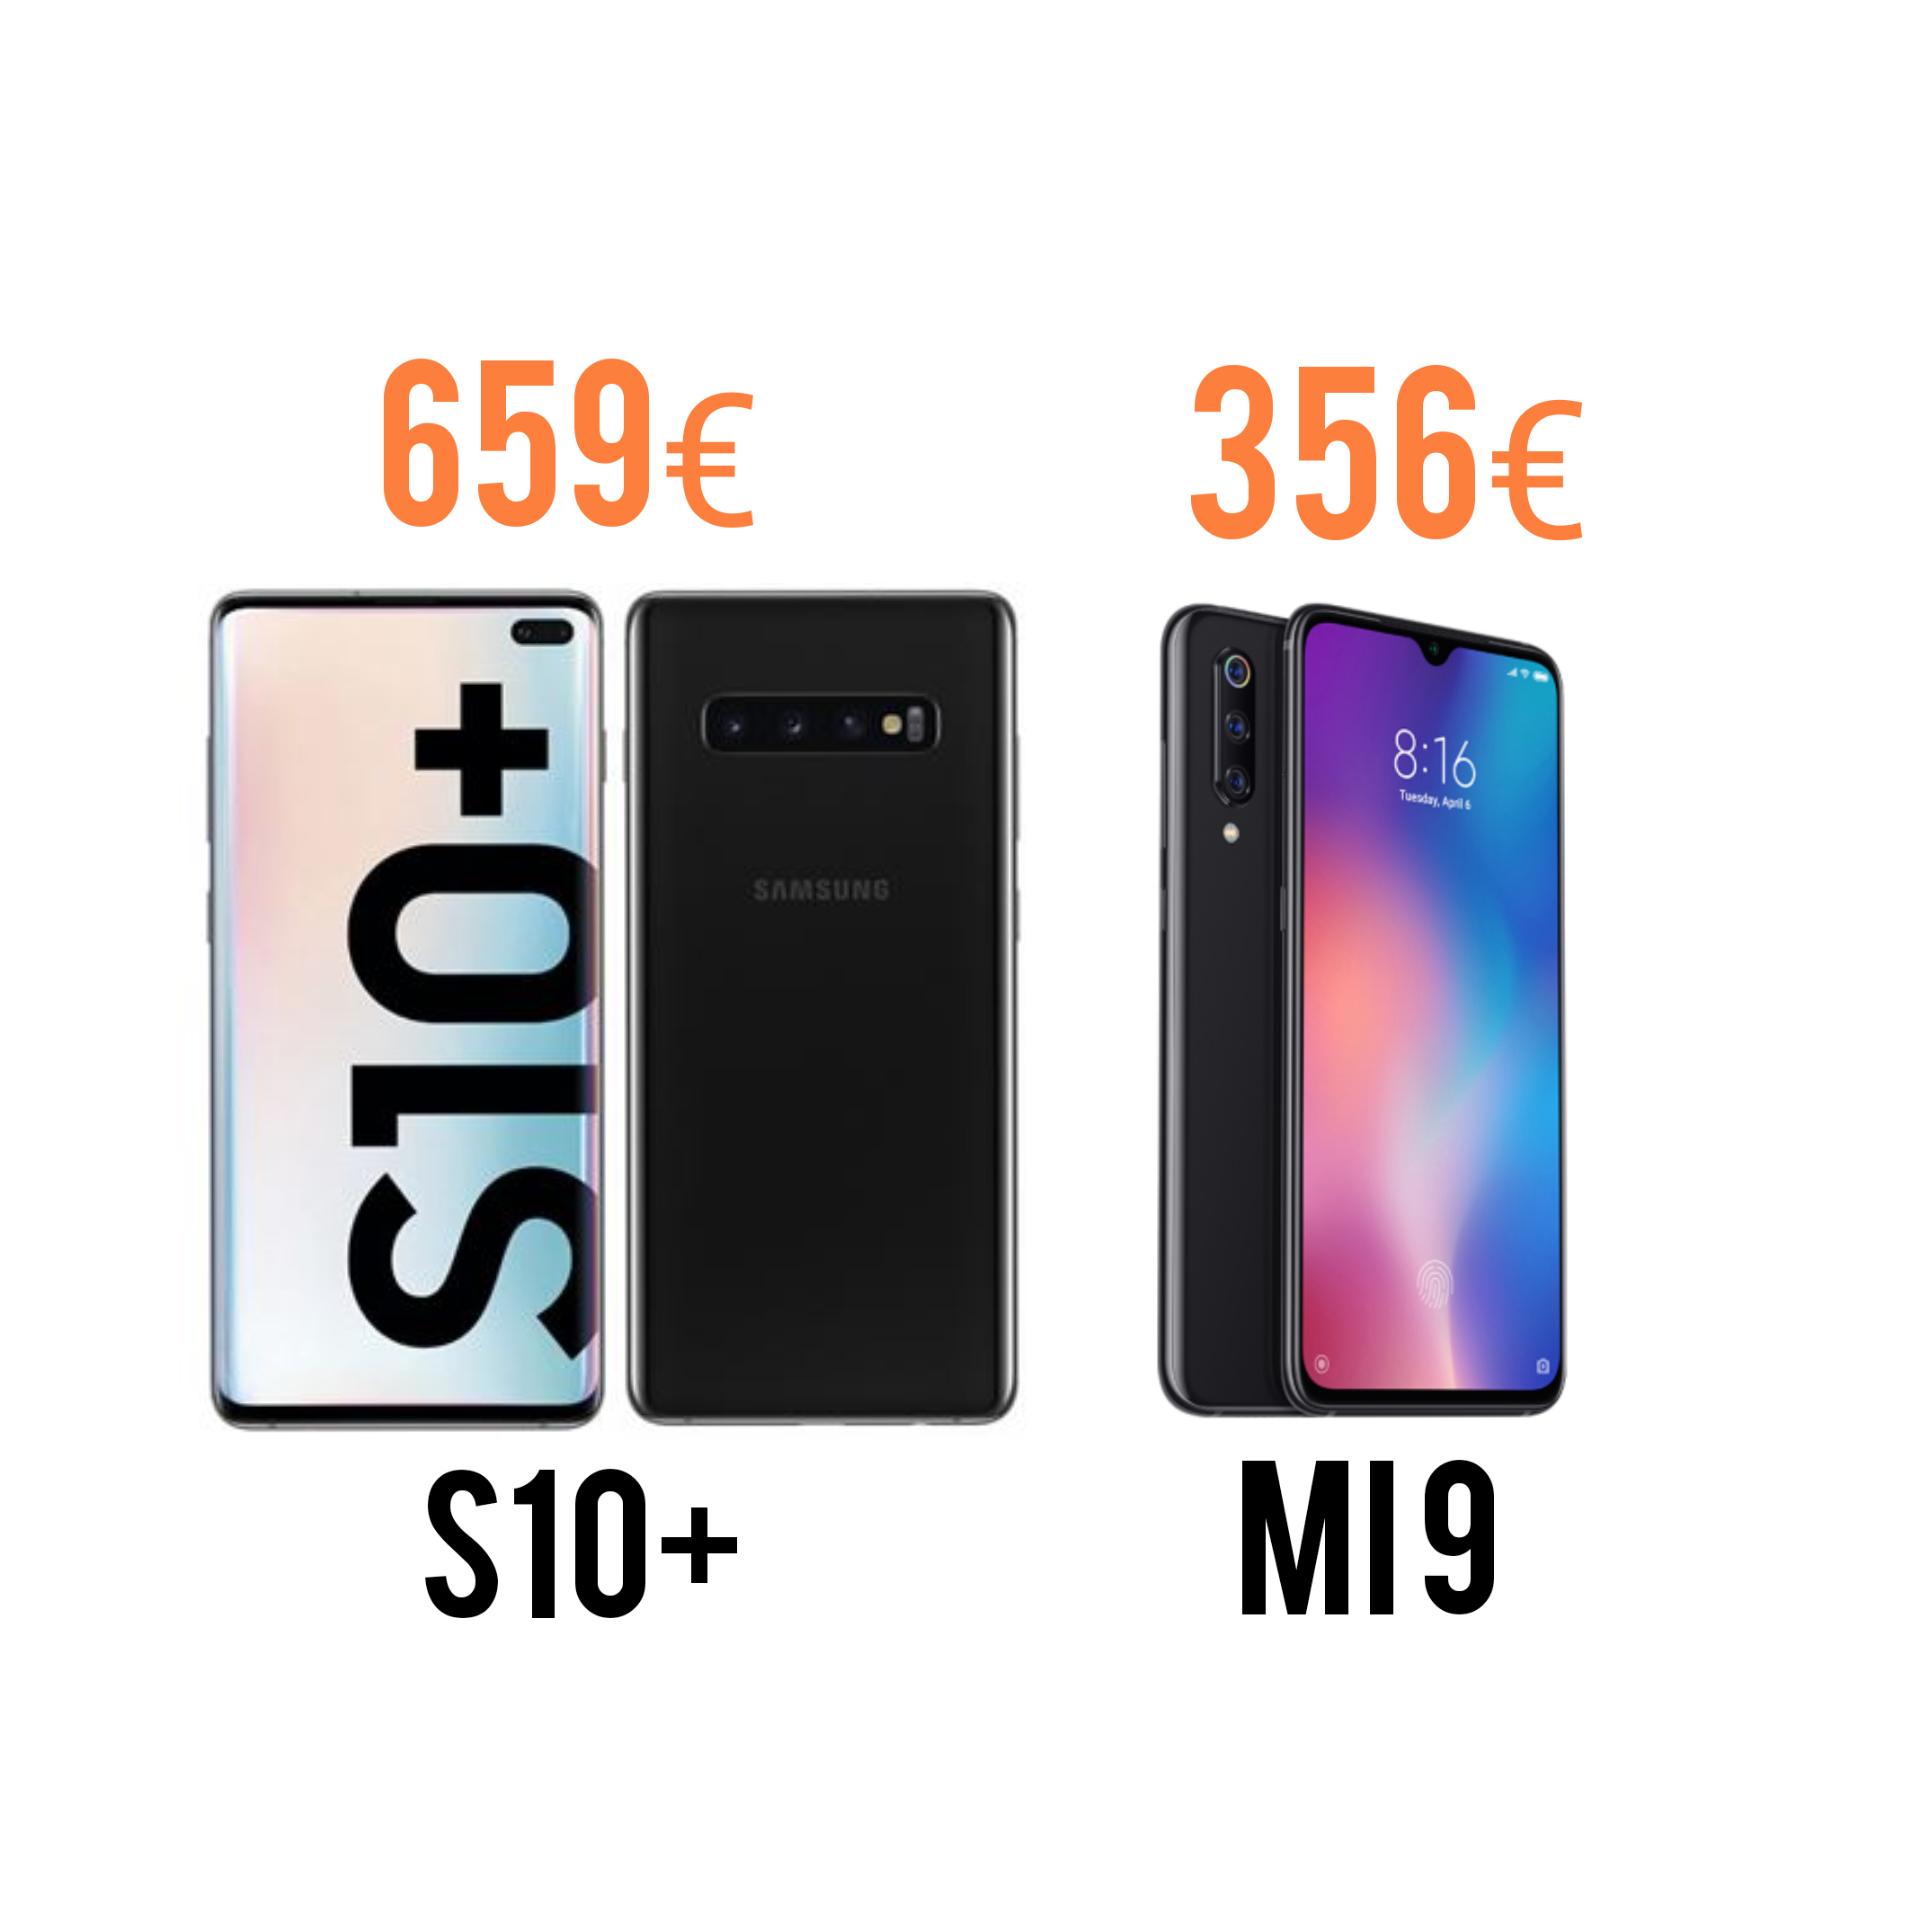 Samsung Galaxy S10+ (659.99€) | Xiaomi Mi 9 (356.82€)